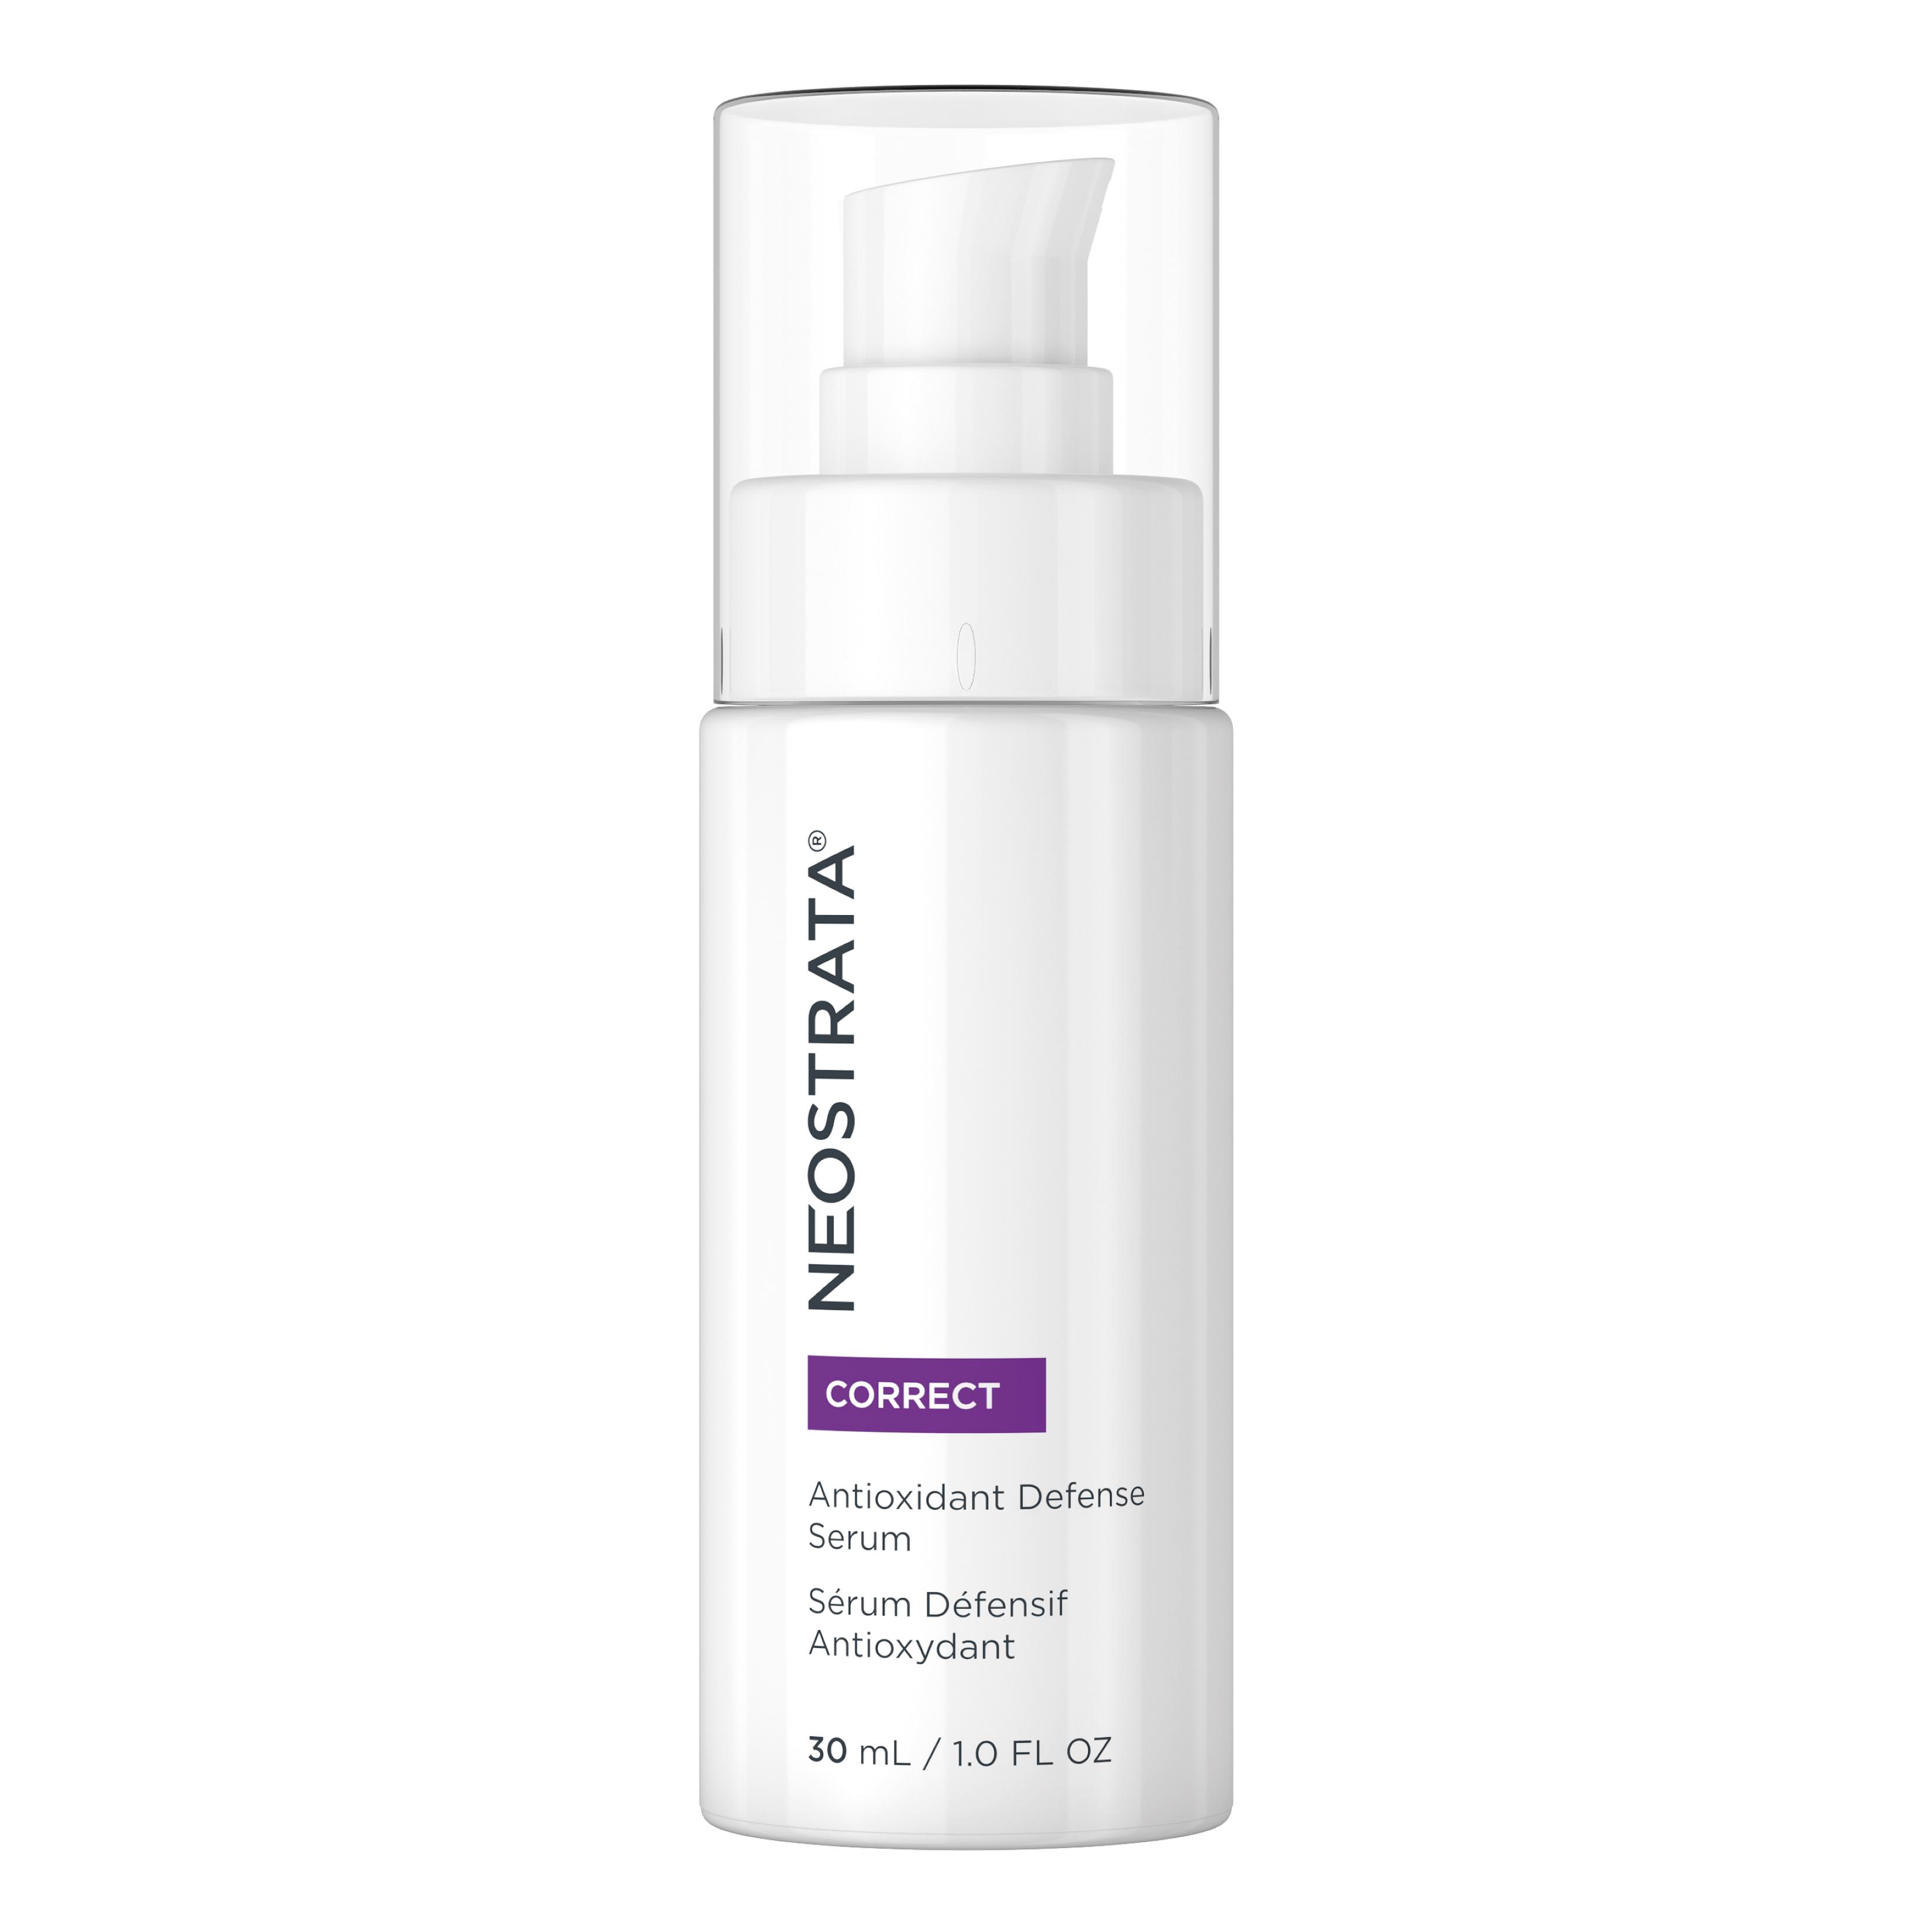 Neostrata Correct Antioxidant Defense Serum 30 ml